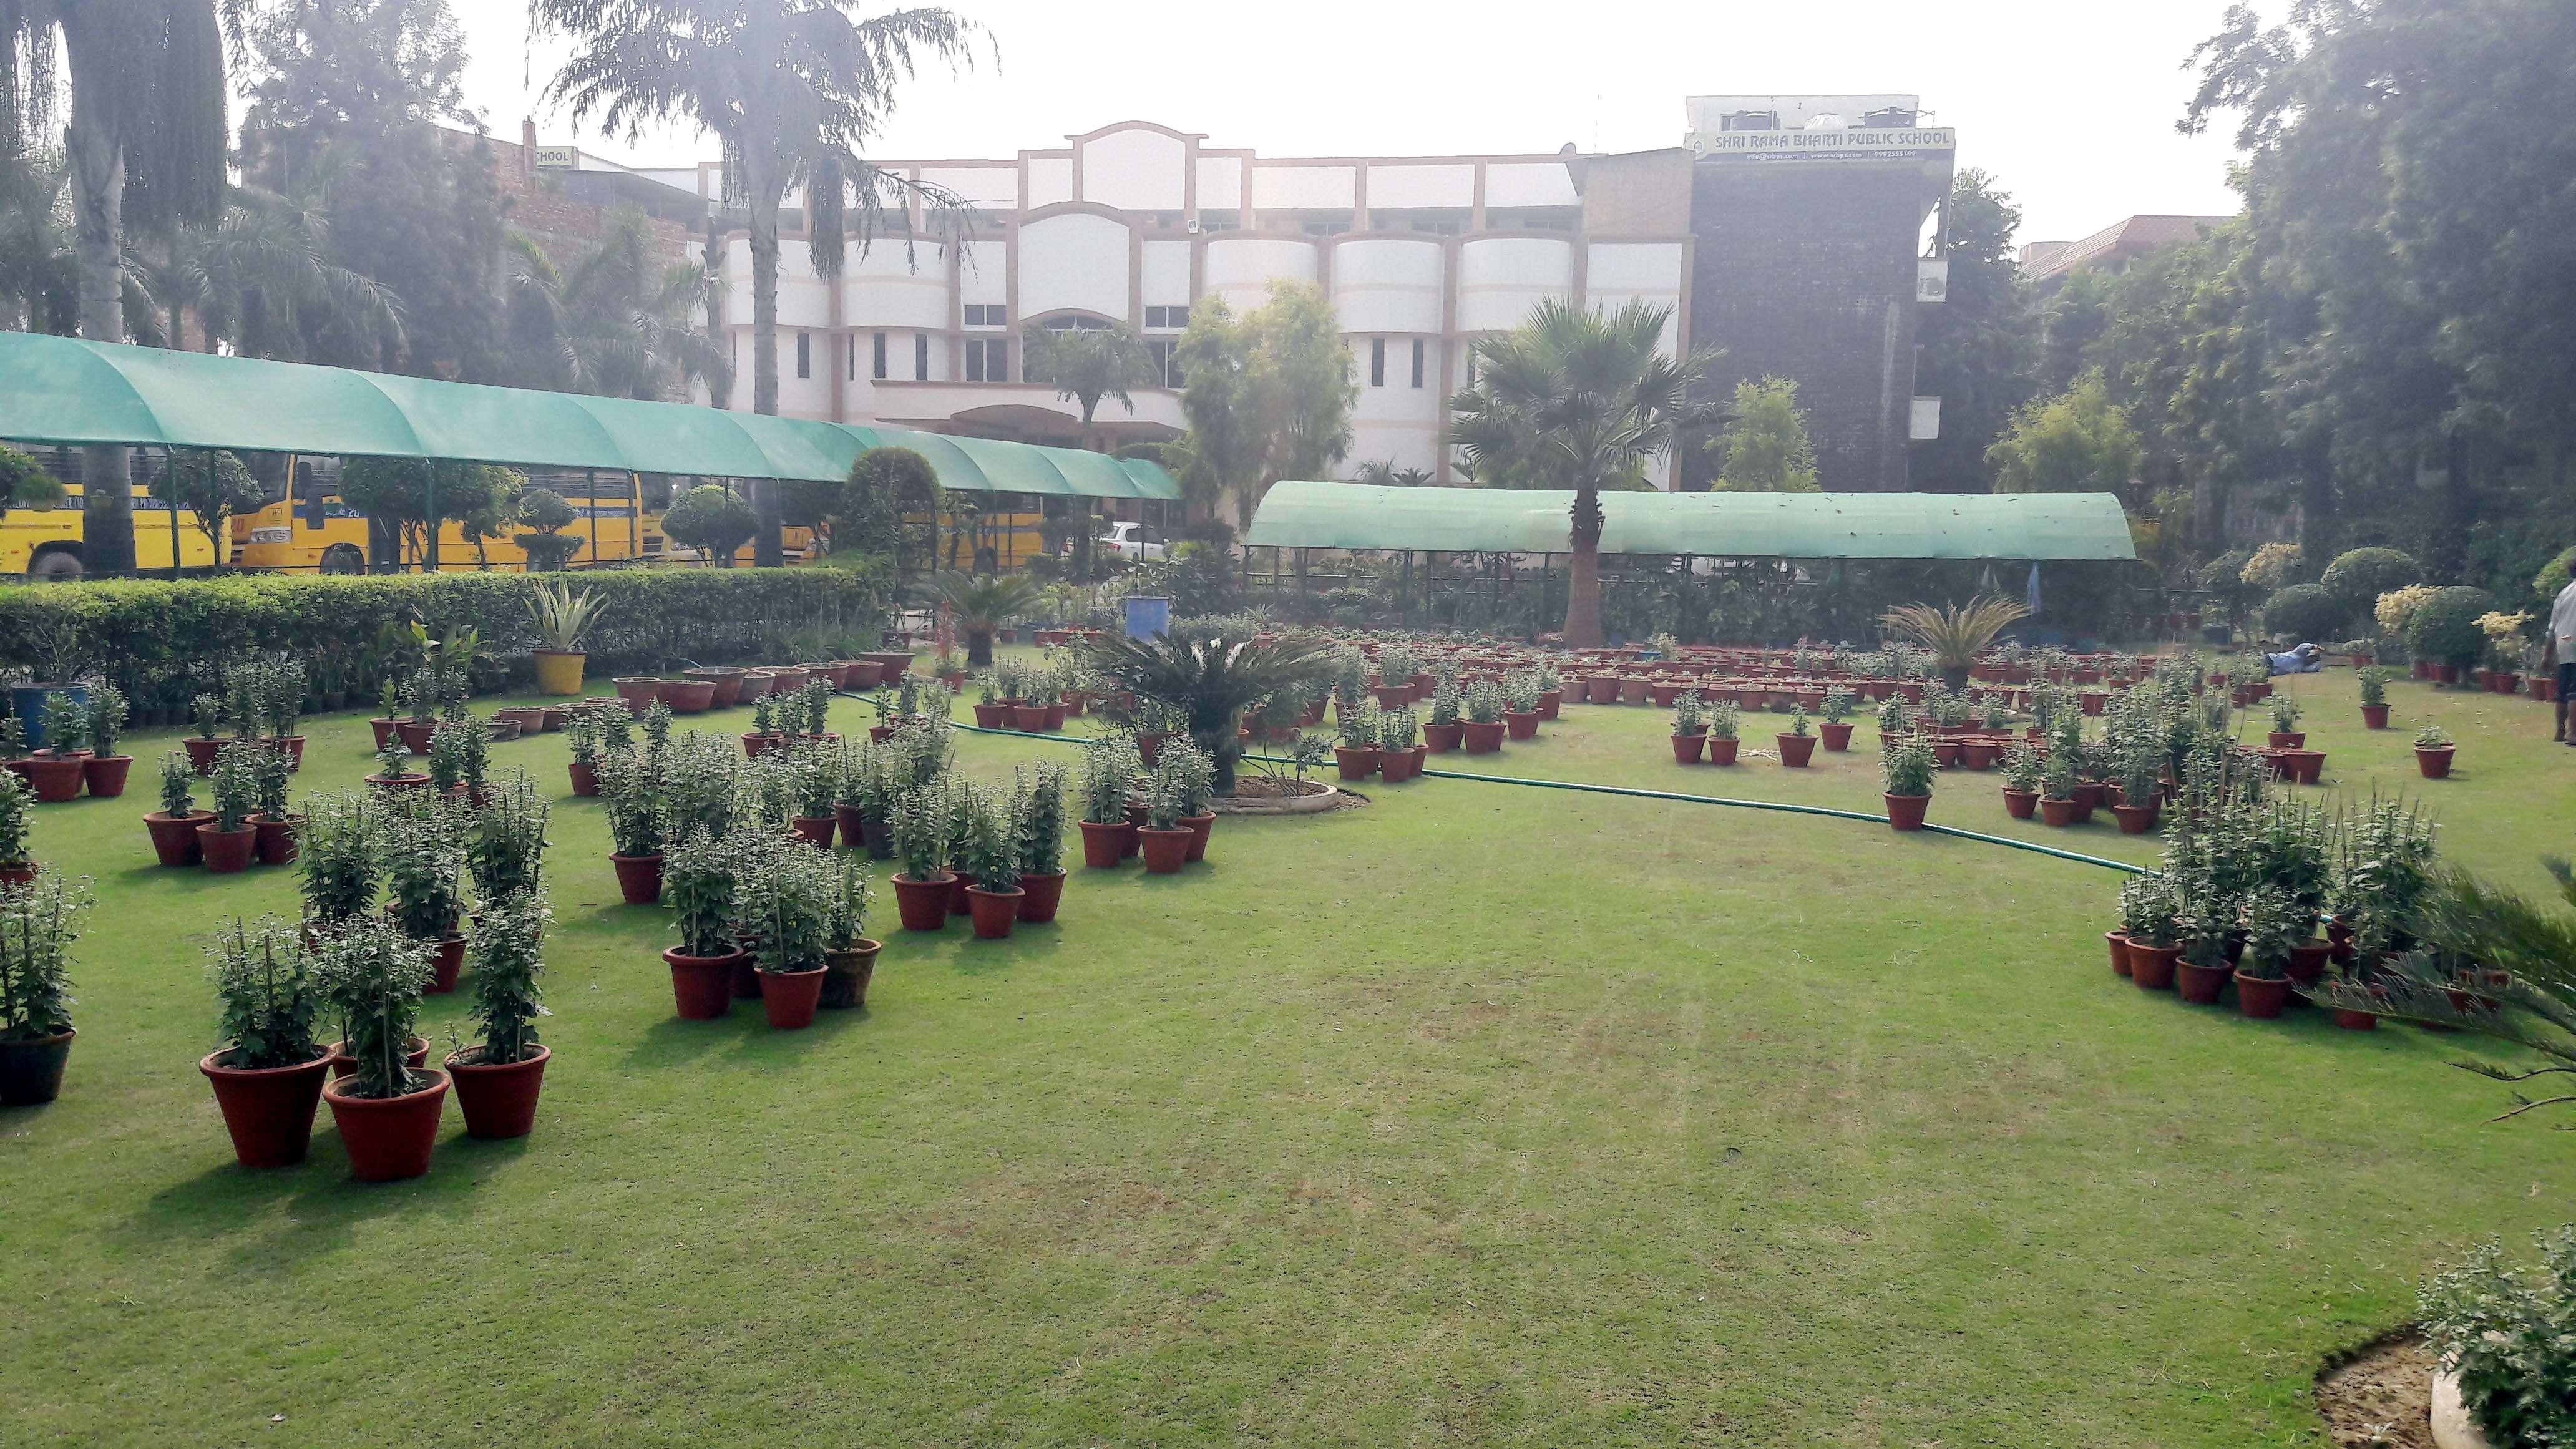 SHRI RAMA BHARTI HIGH SCHOOL NEAR SAINIK NAGAR SECTOR 6 BAHADURGARH HARYANA 530447